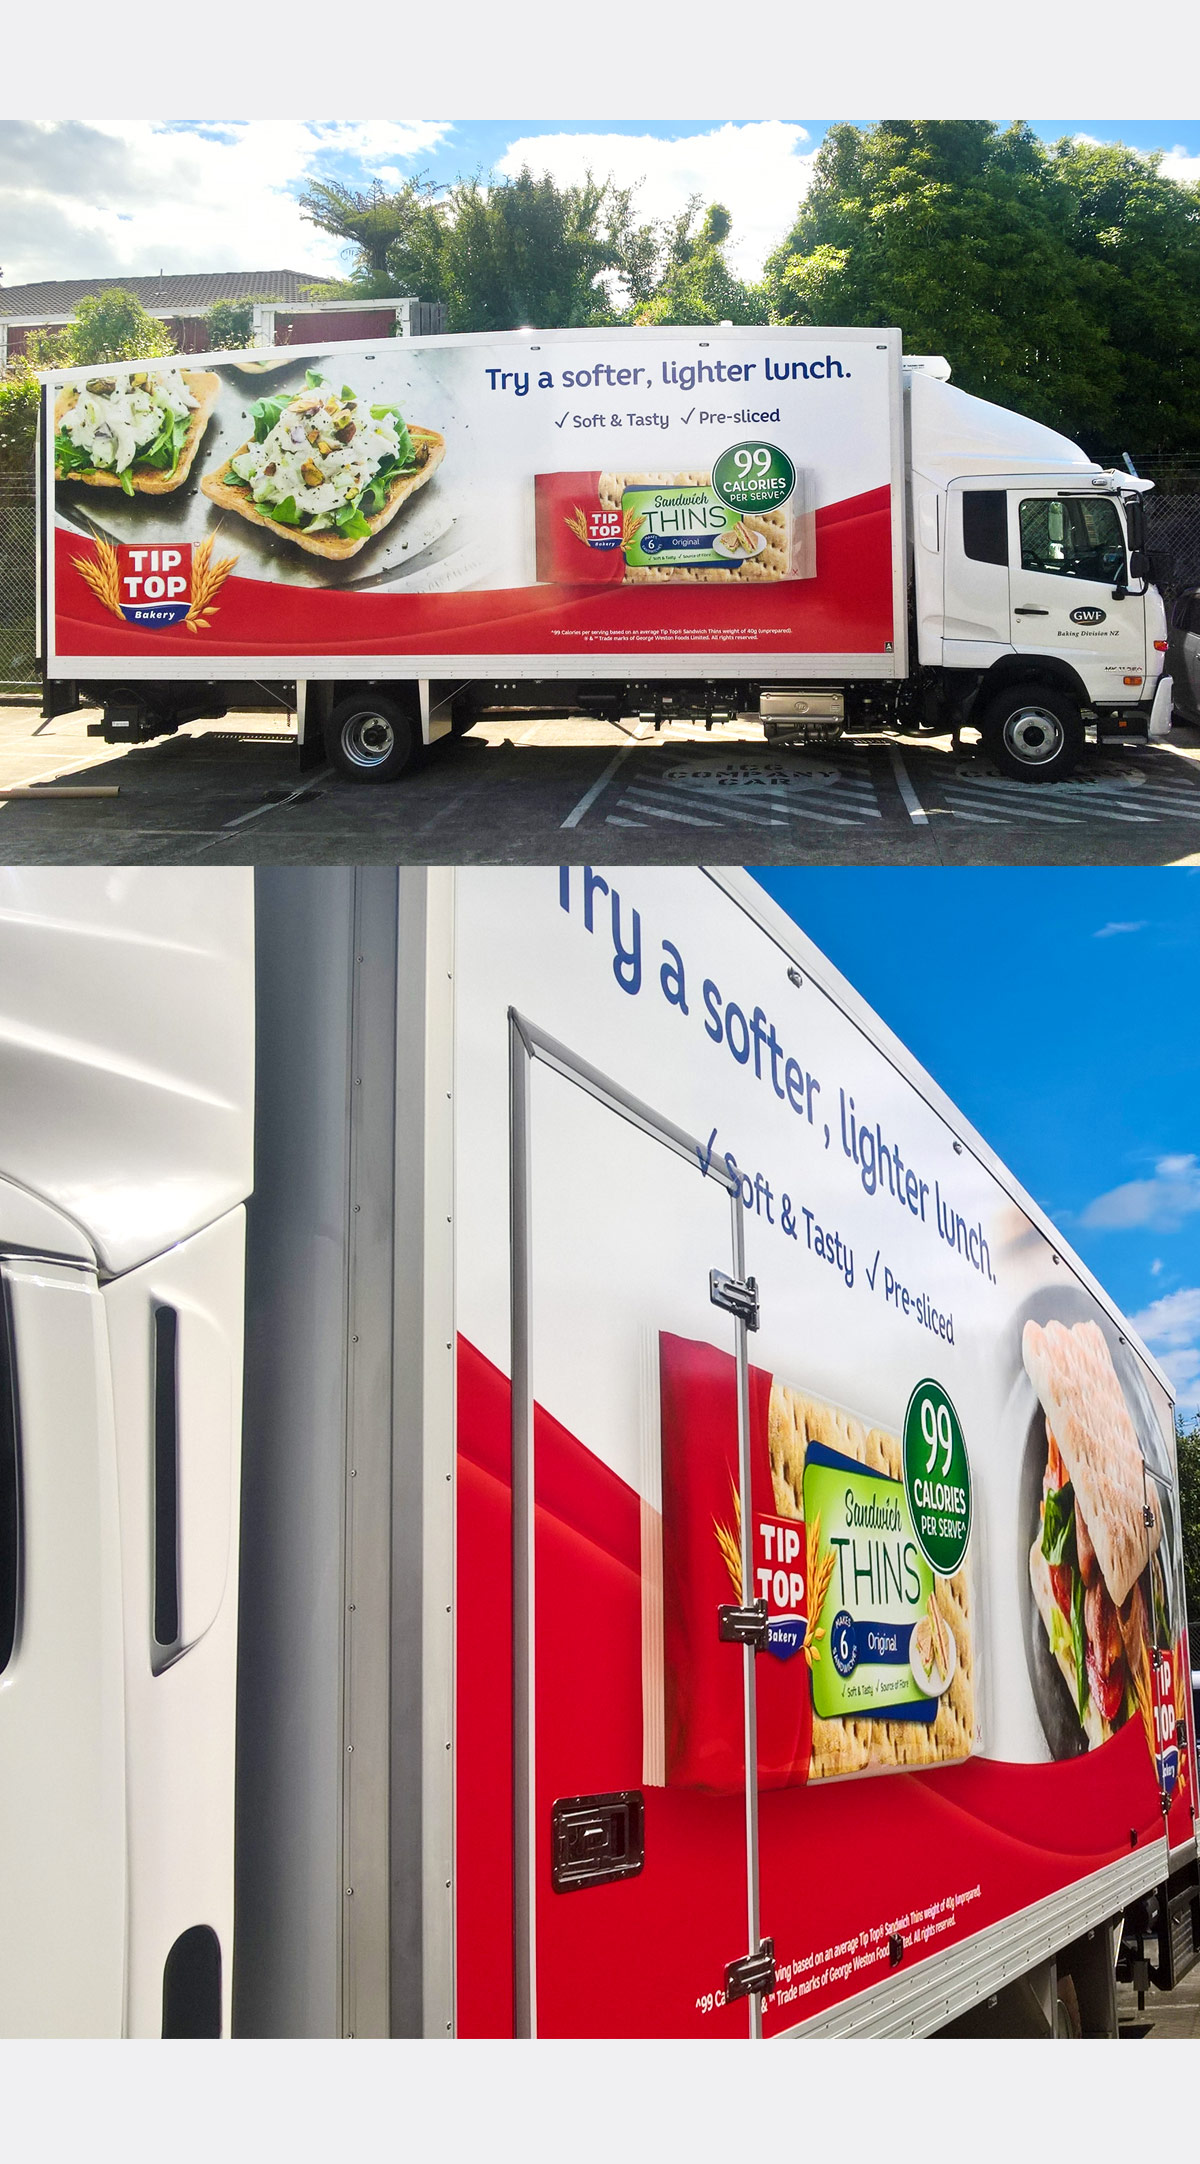 Trucks in tip-top shape